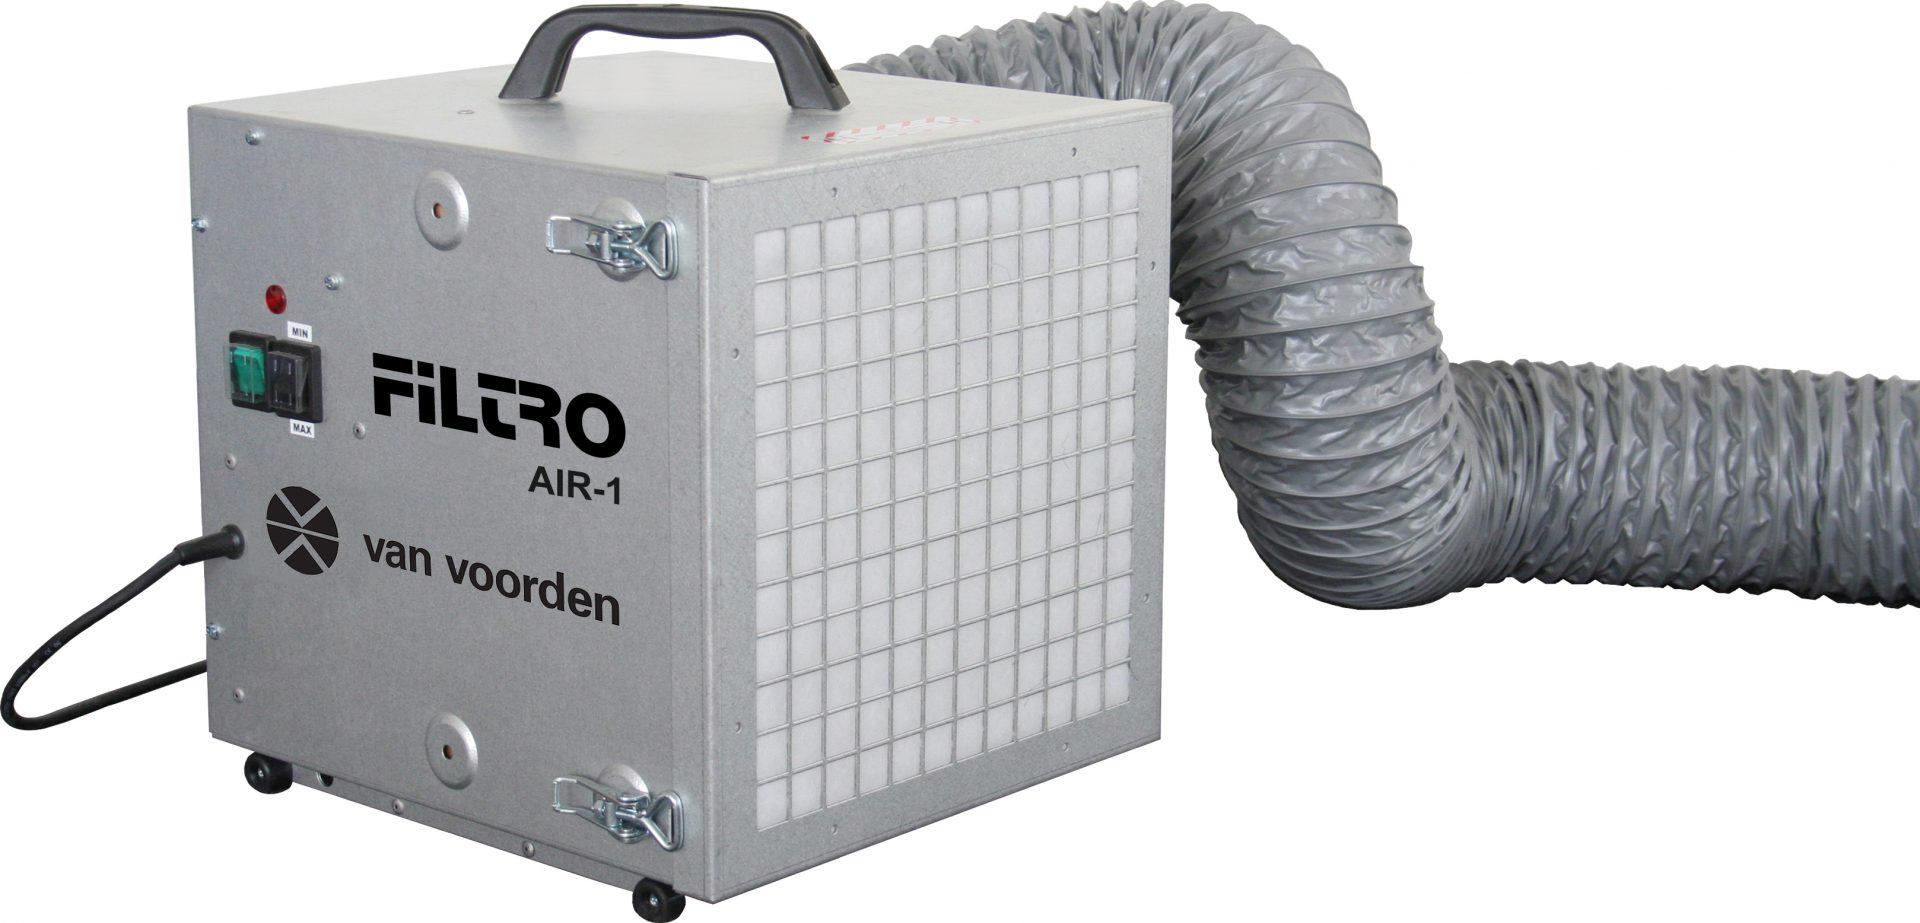 luchtreiniger-kwartsstof-ruimteventilatie-afzuiging-bouw-stof-filter-filtro-air-1-voorden